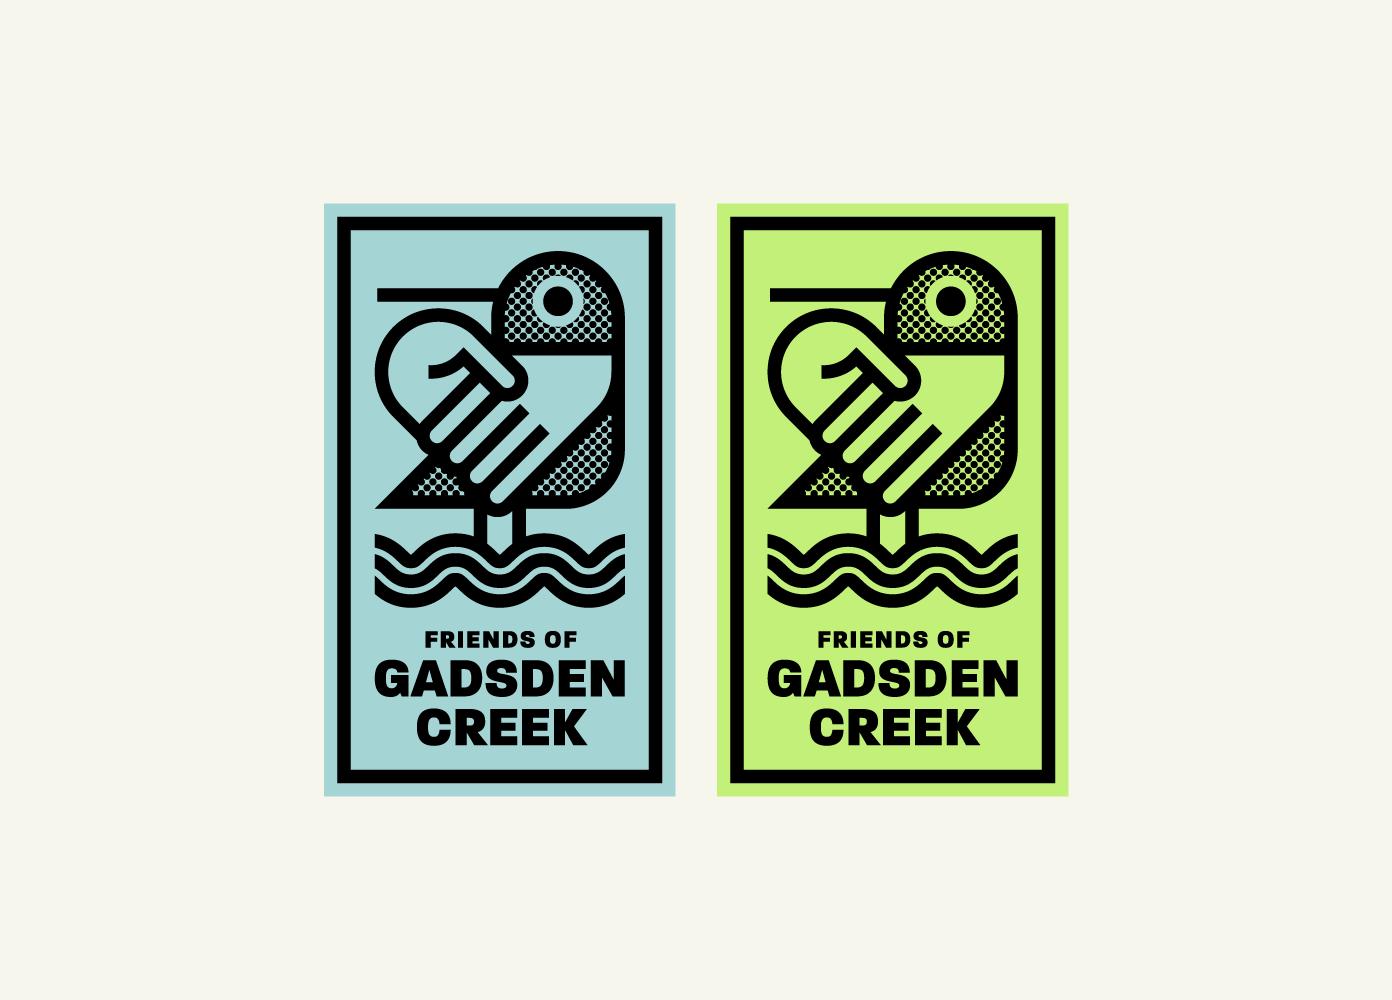 Friends of Gadsden Creek